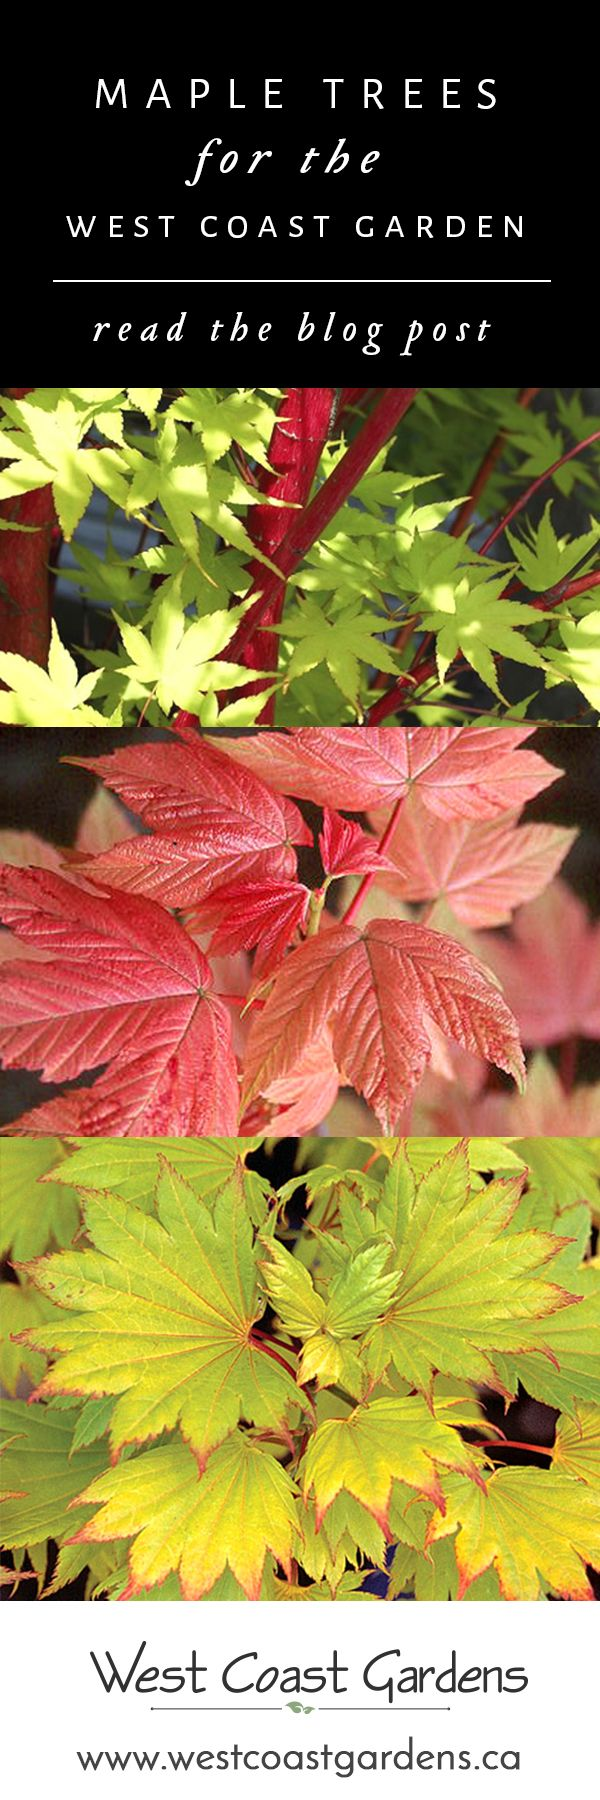 Maple Trees for the West Coast Gardener!